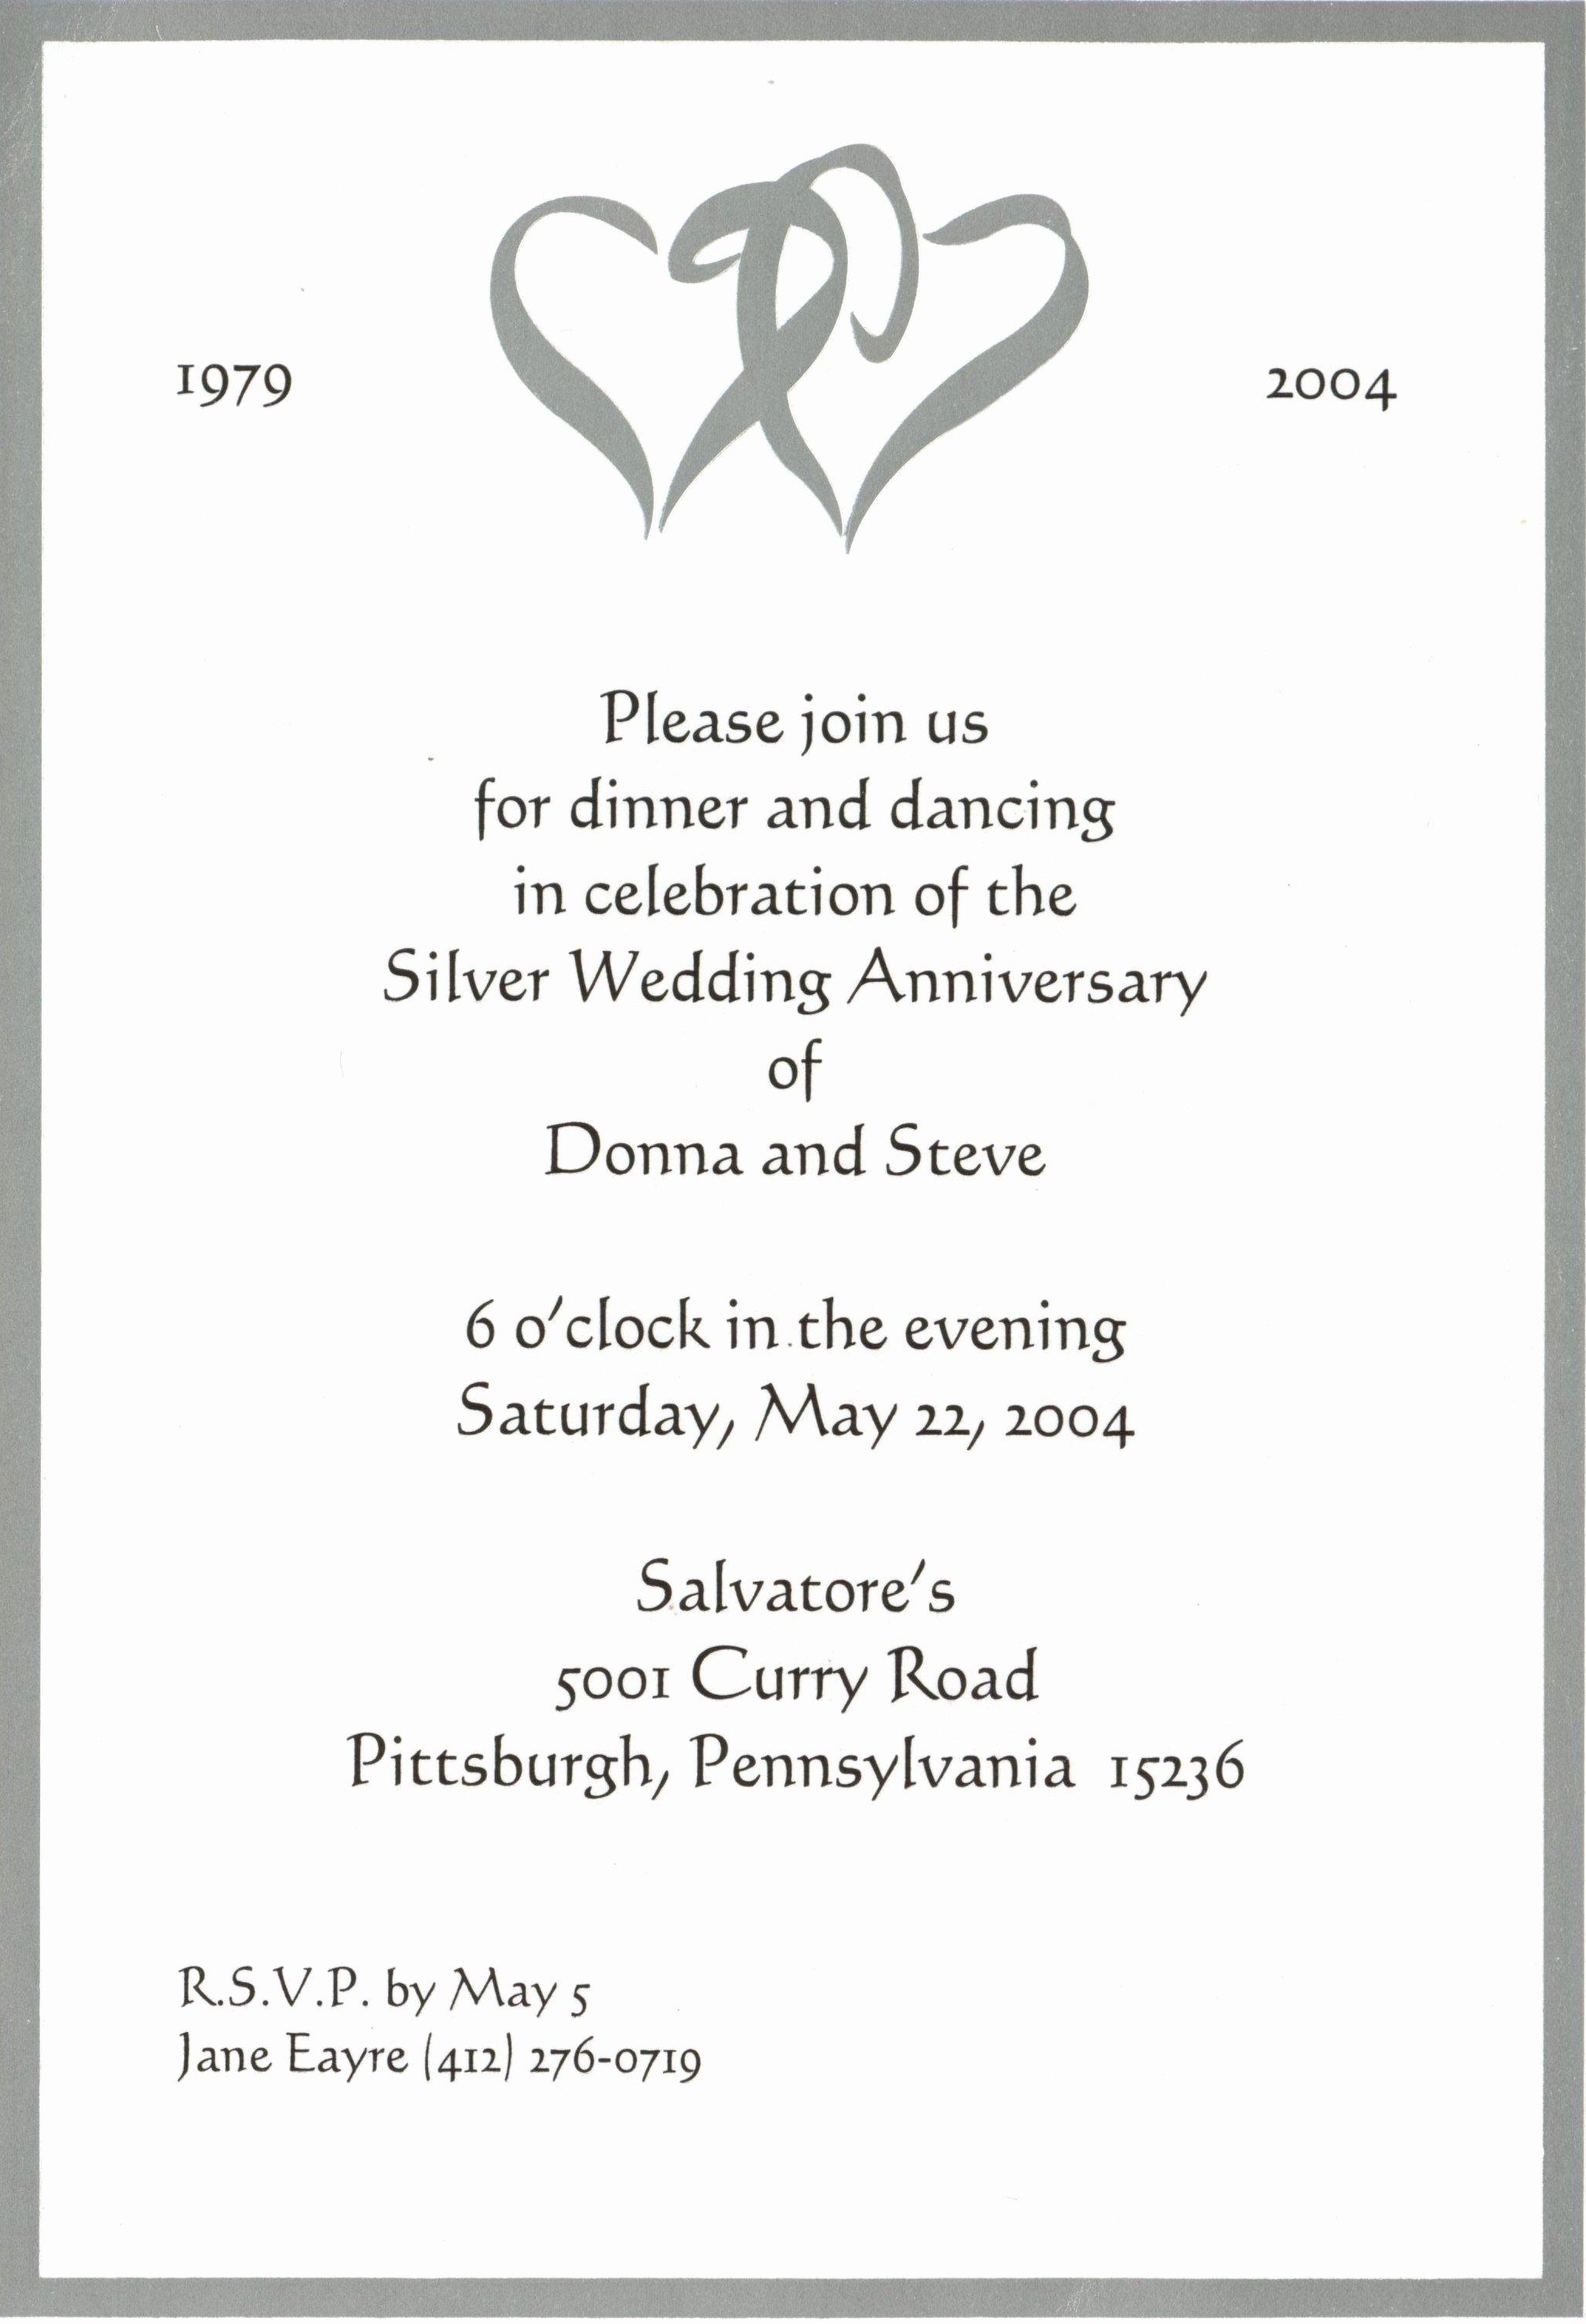 Wedding Anniversary Invitation Templates Unique 50th Wedding Anniversary Invitation Templates Awesome